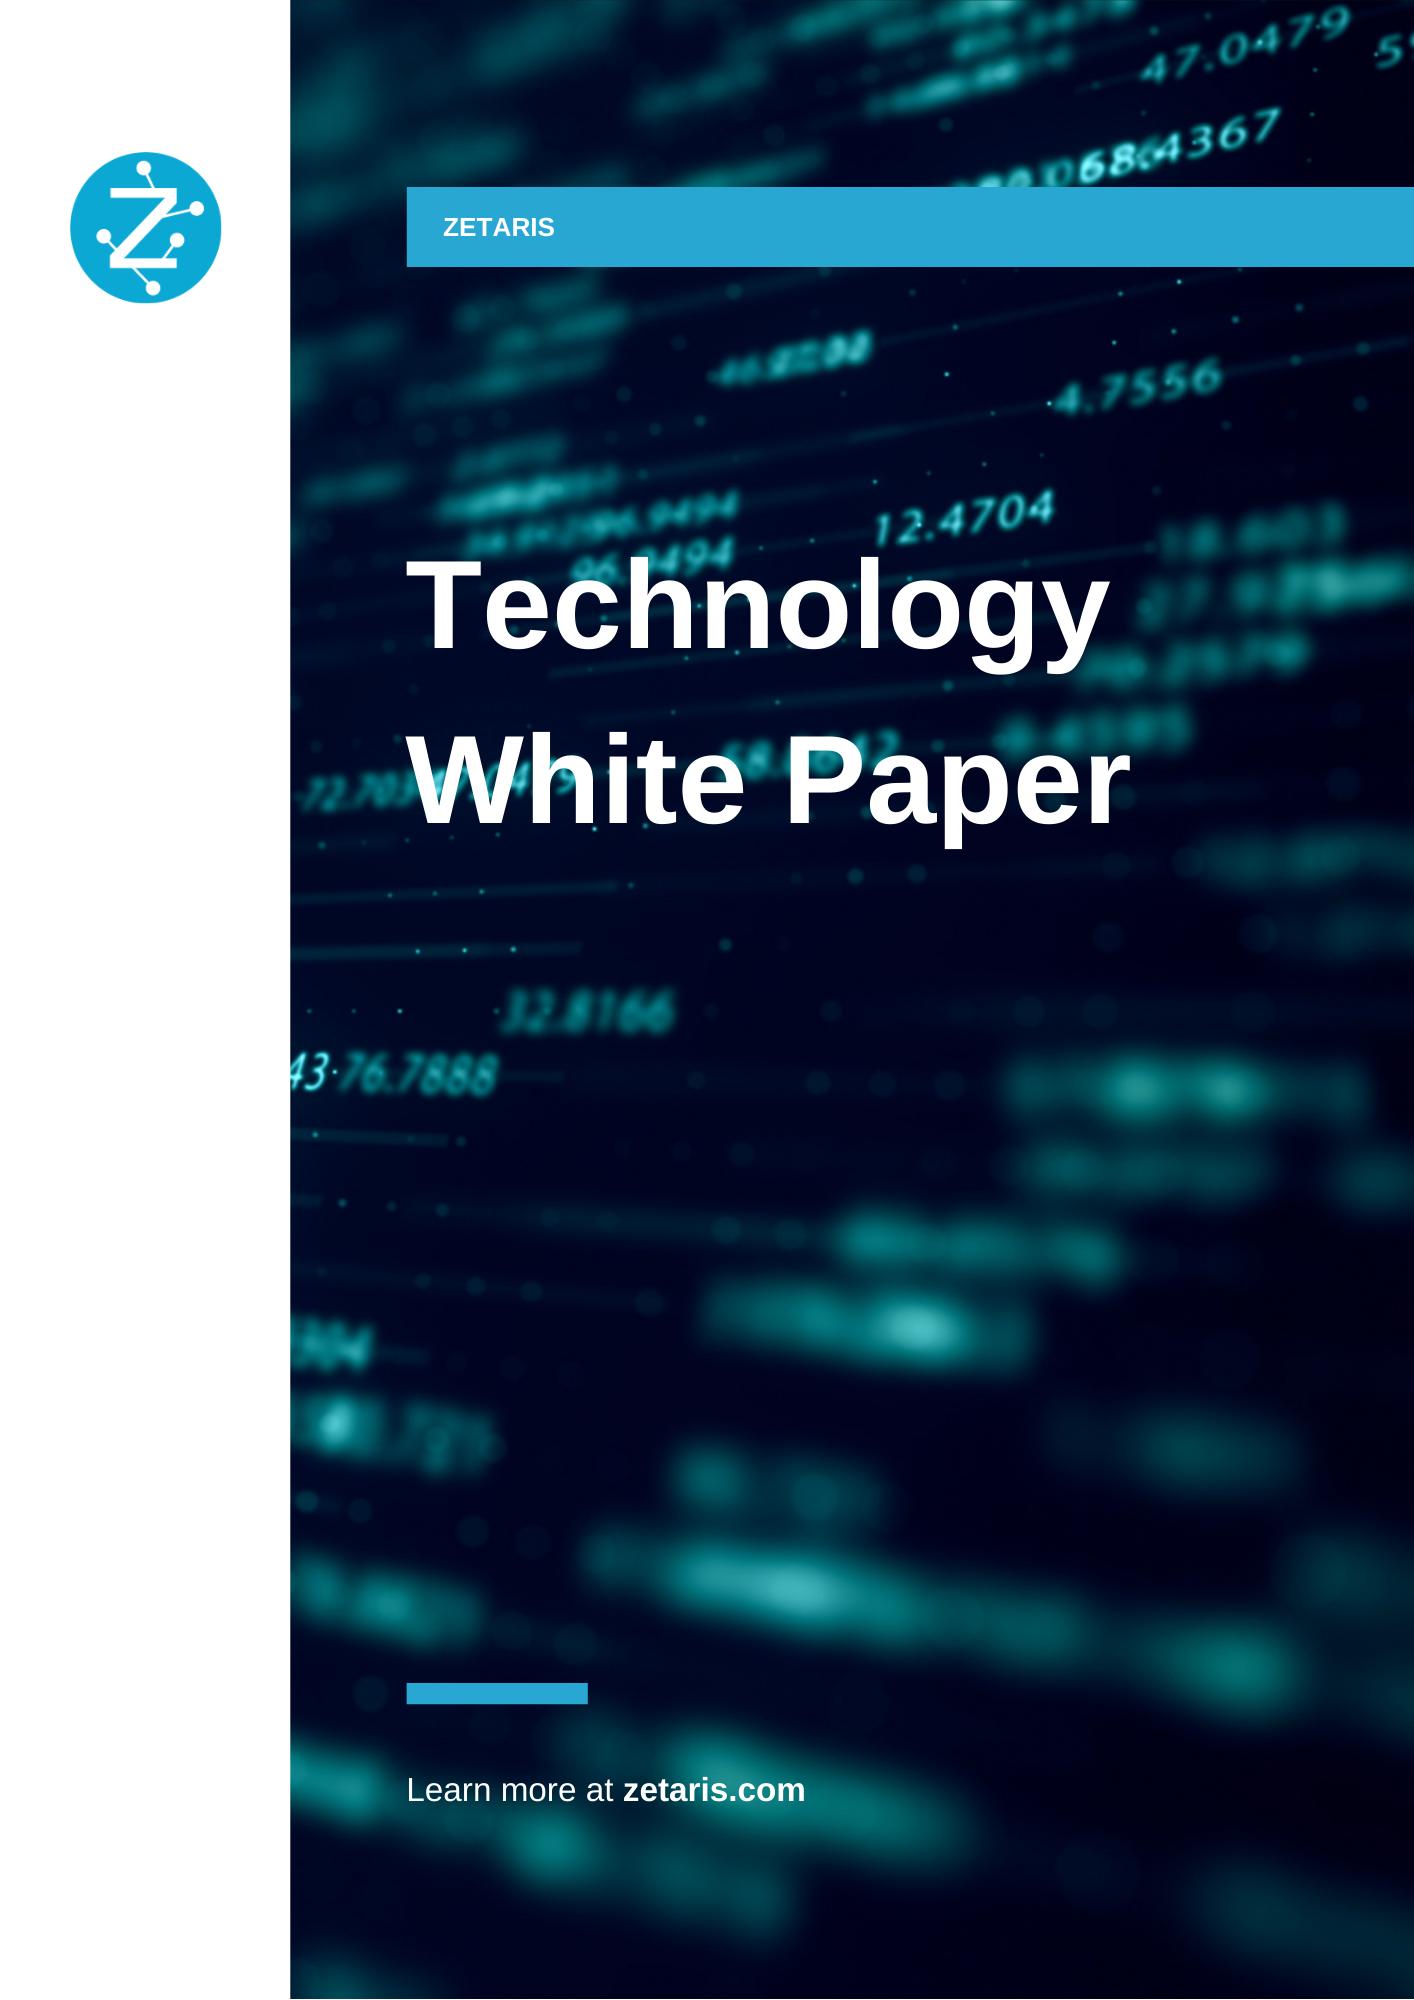 Technology White Paper